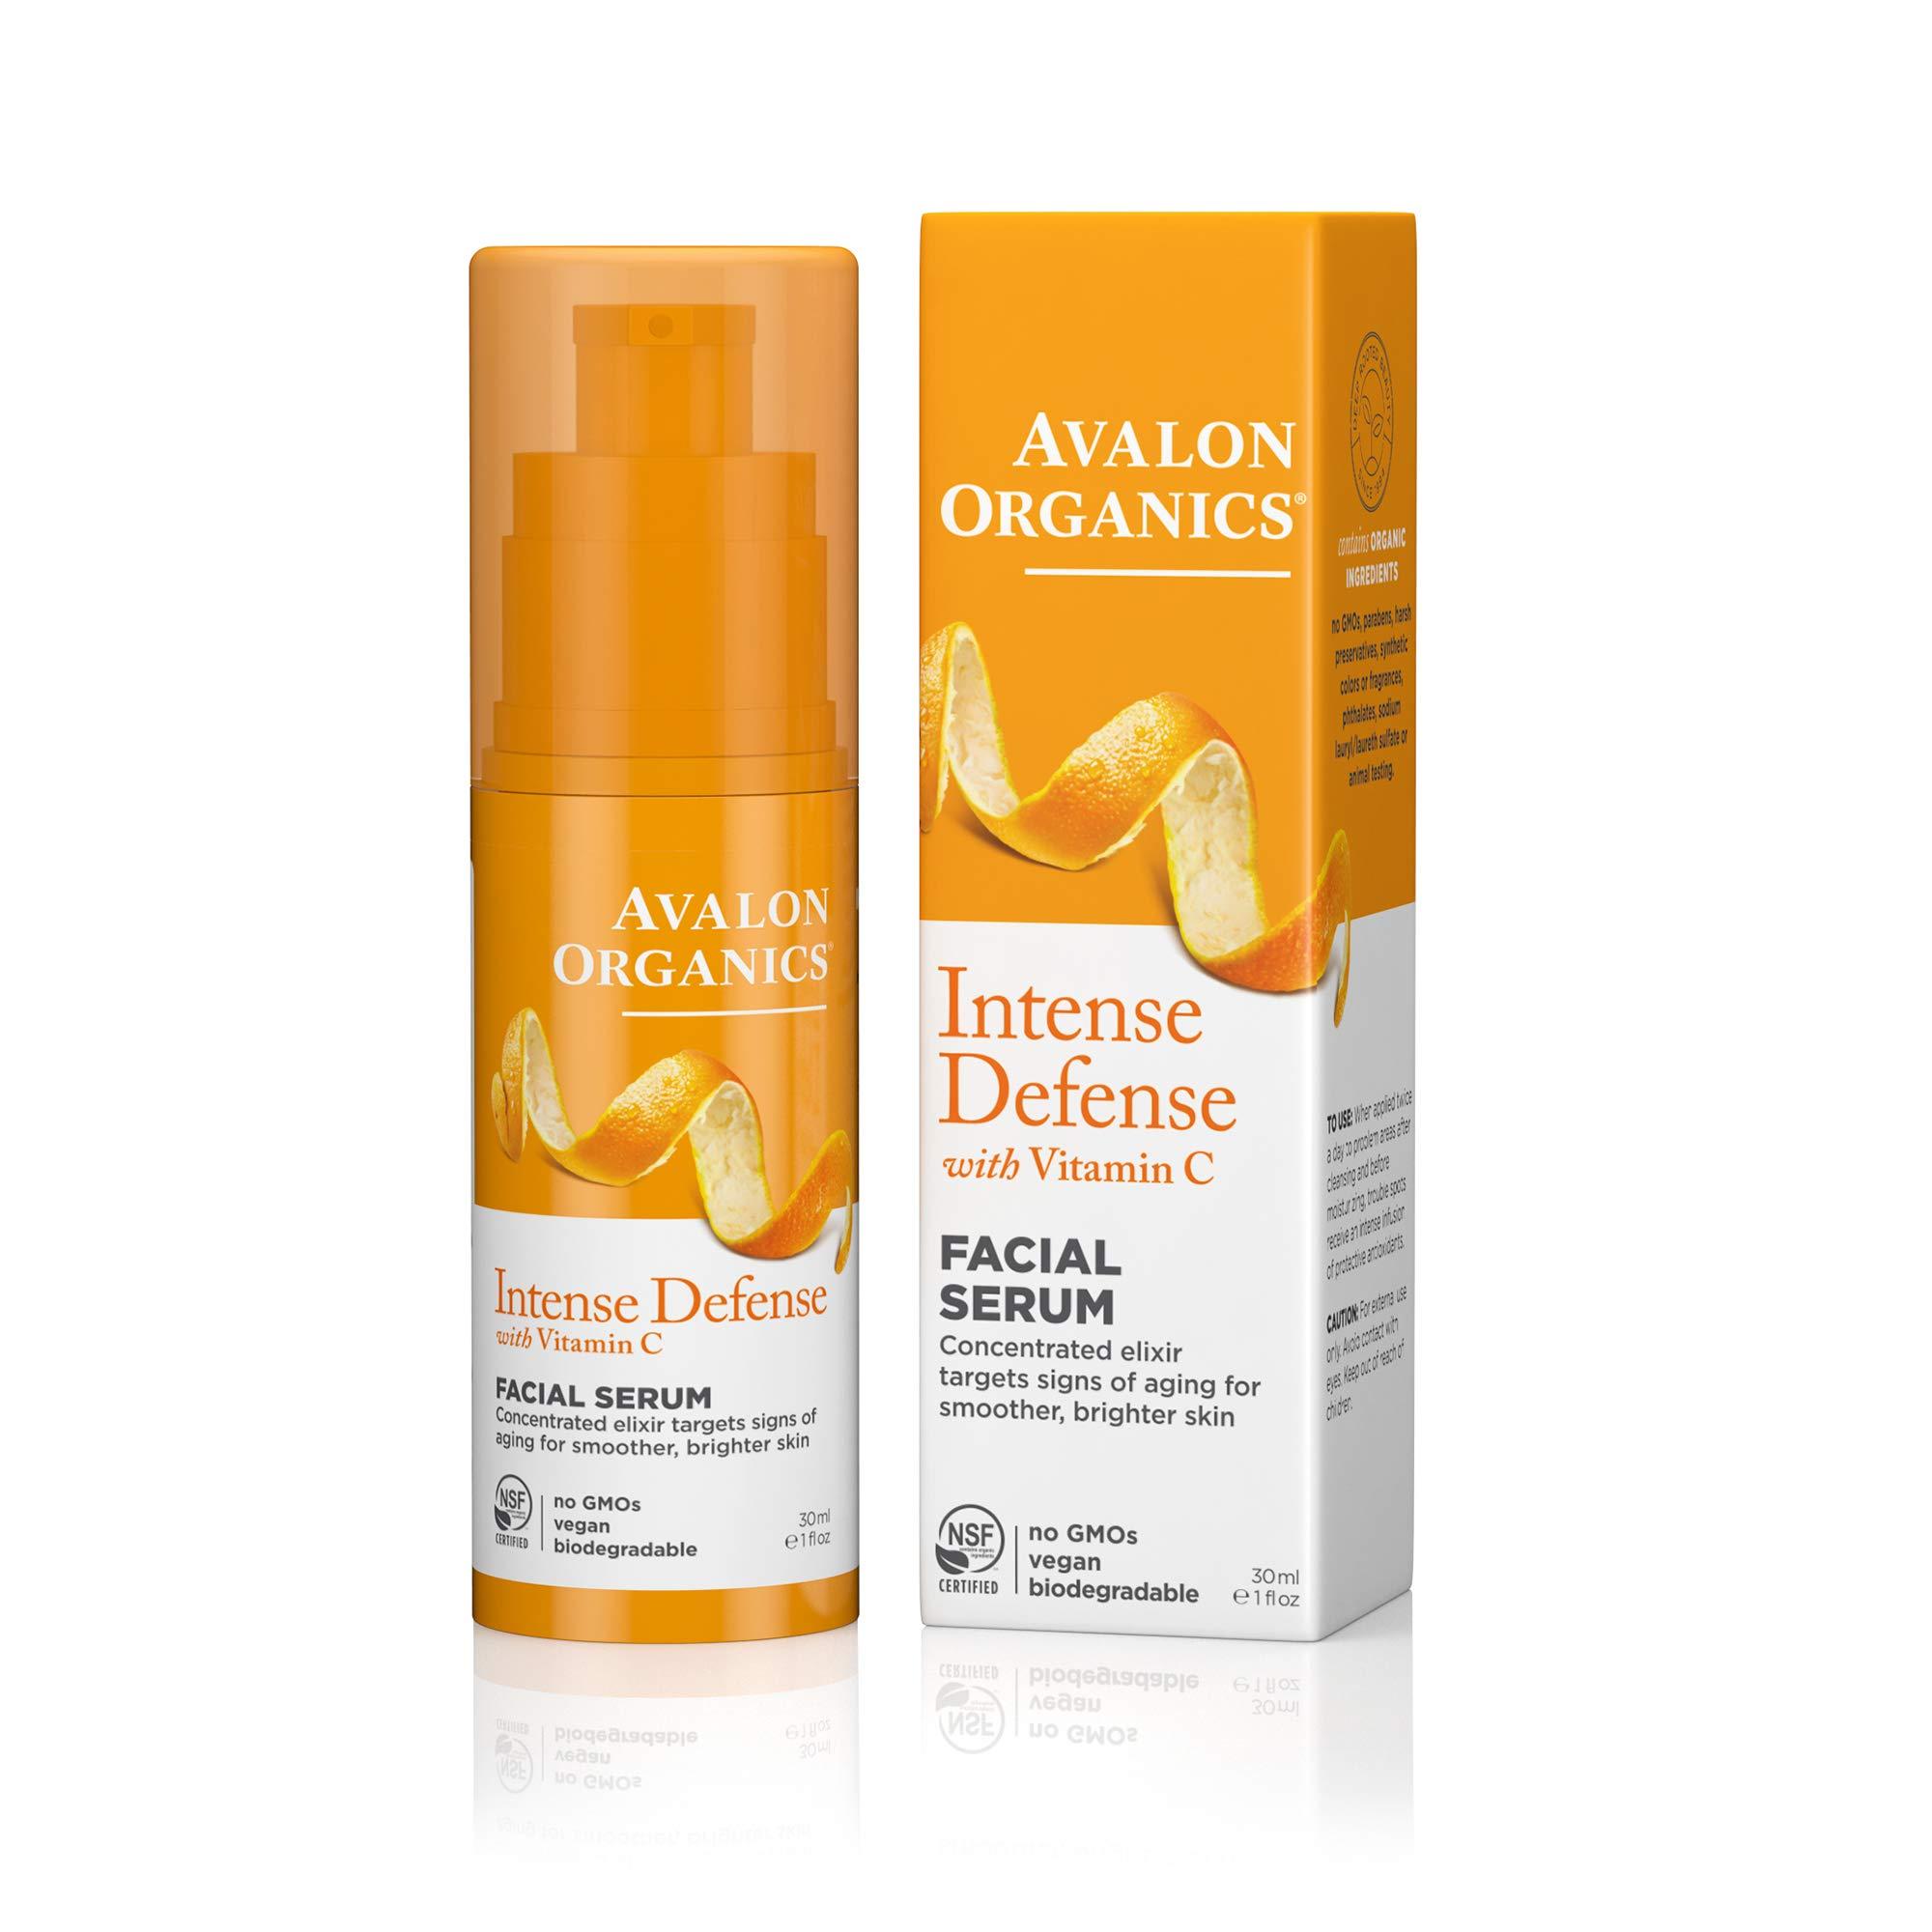 Avalon Organics Intense Defense Facial